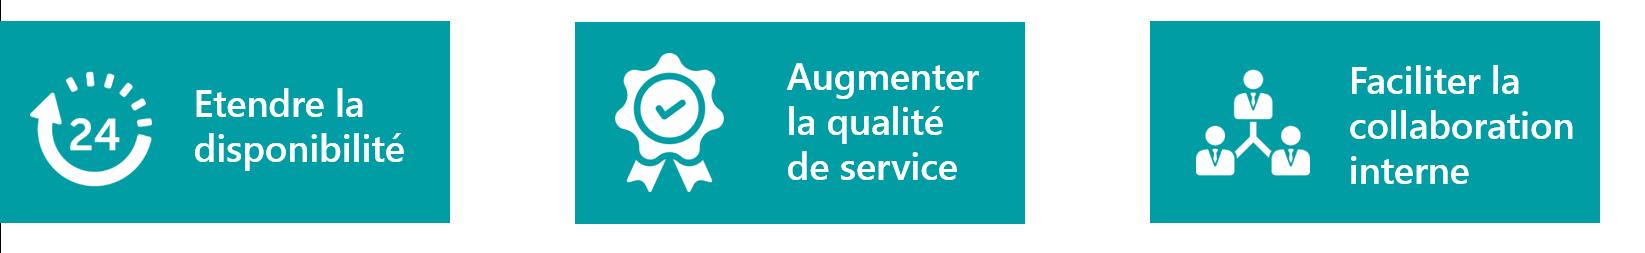 enjeux-customer service portal